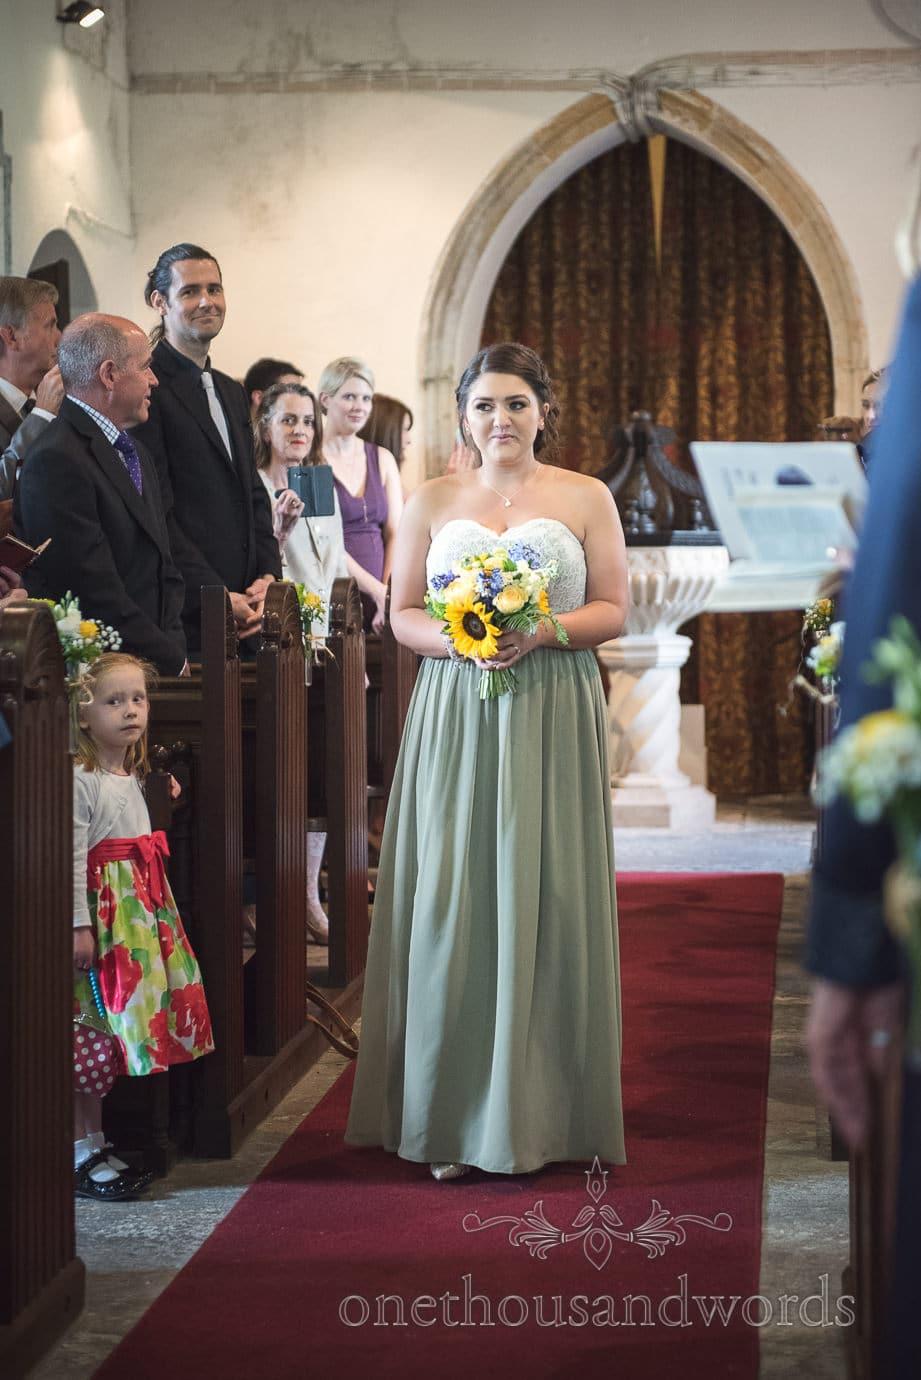 Bridesmaid in dusty green dress with sunflower bouquet walks down church aisle